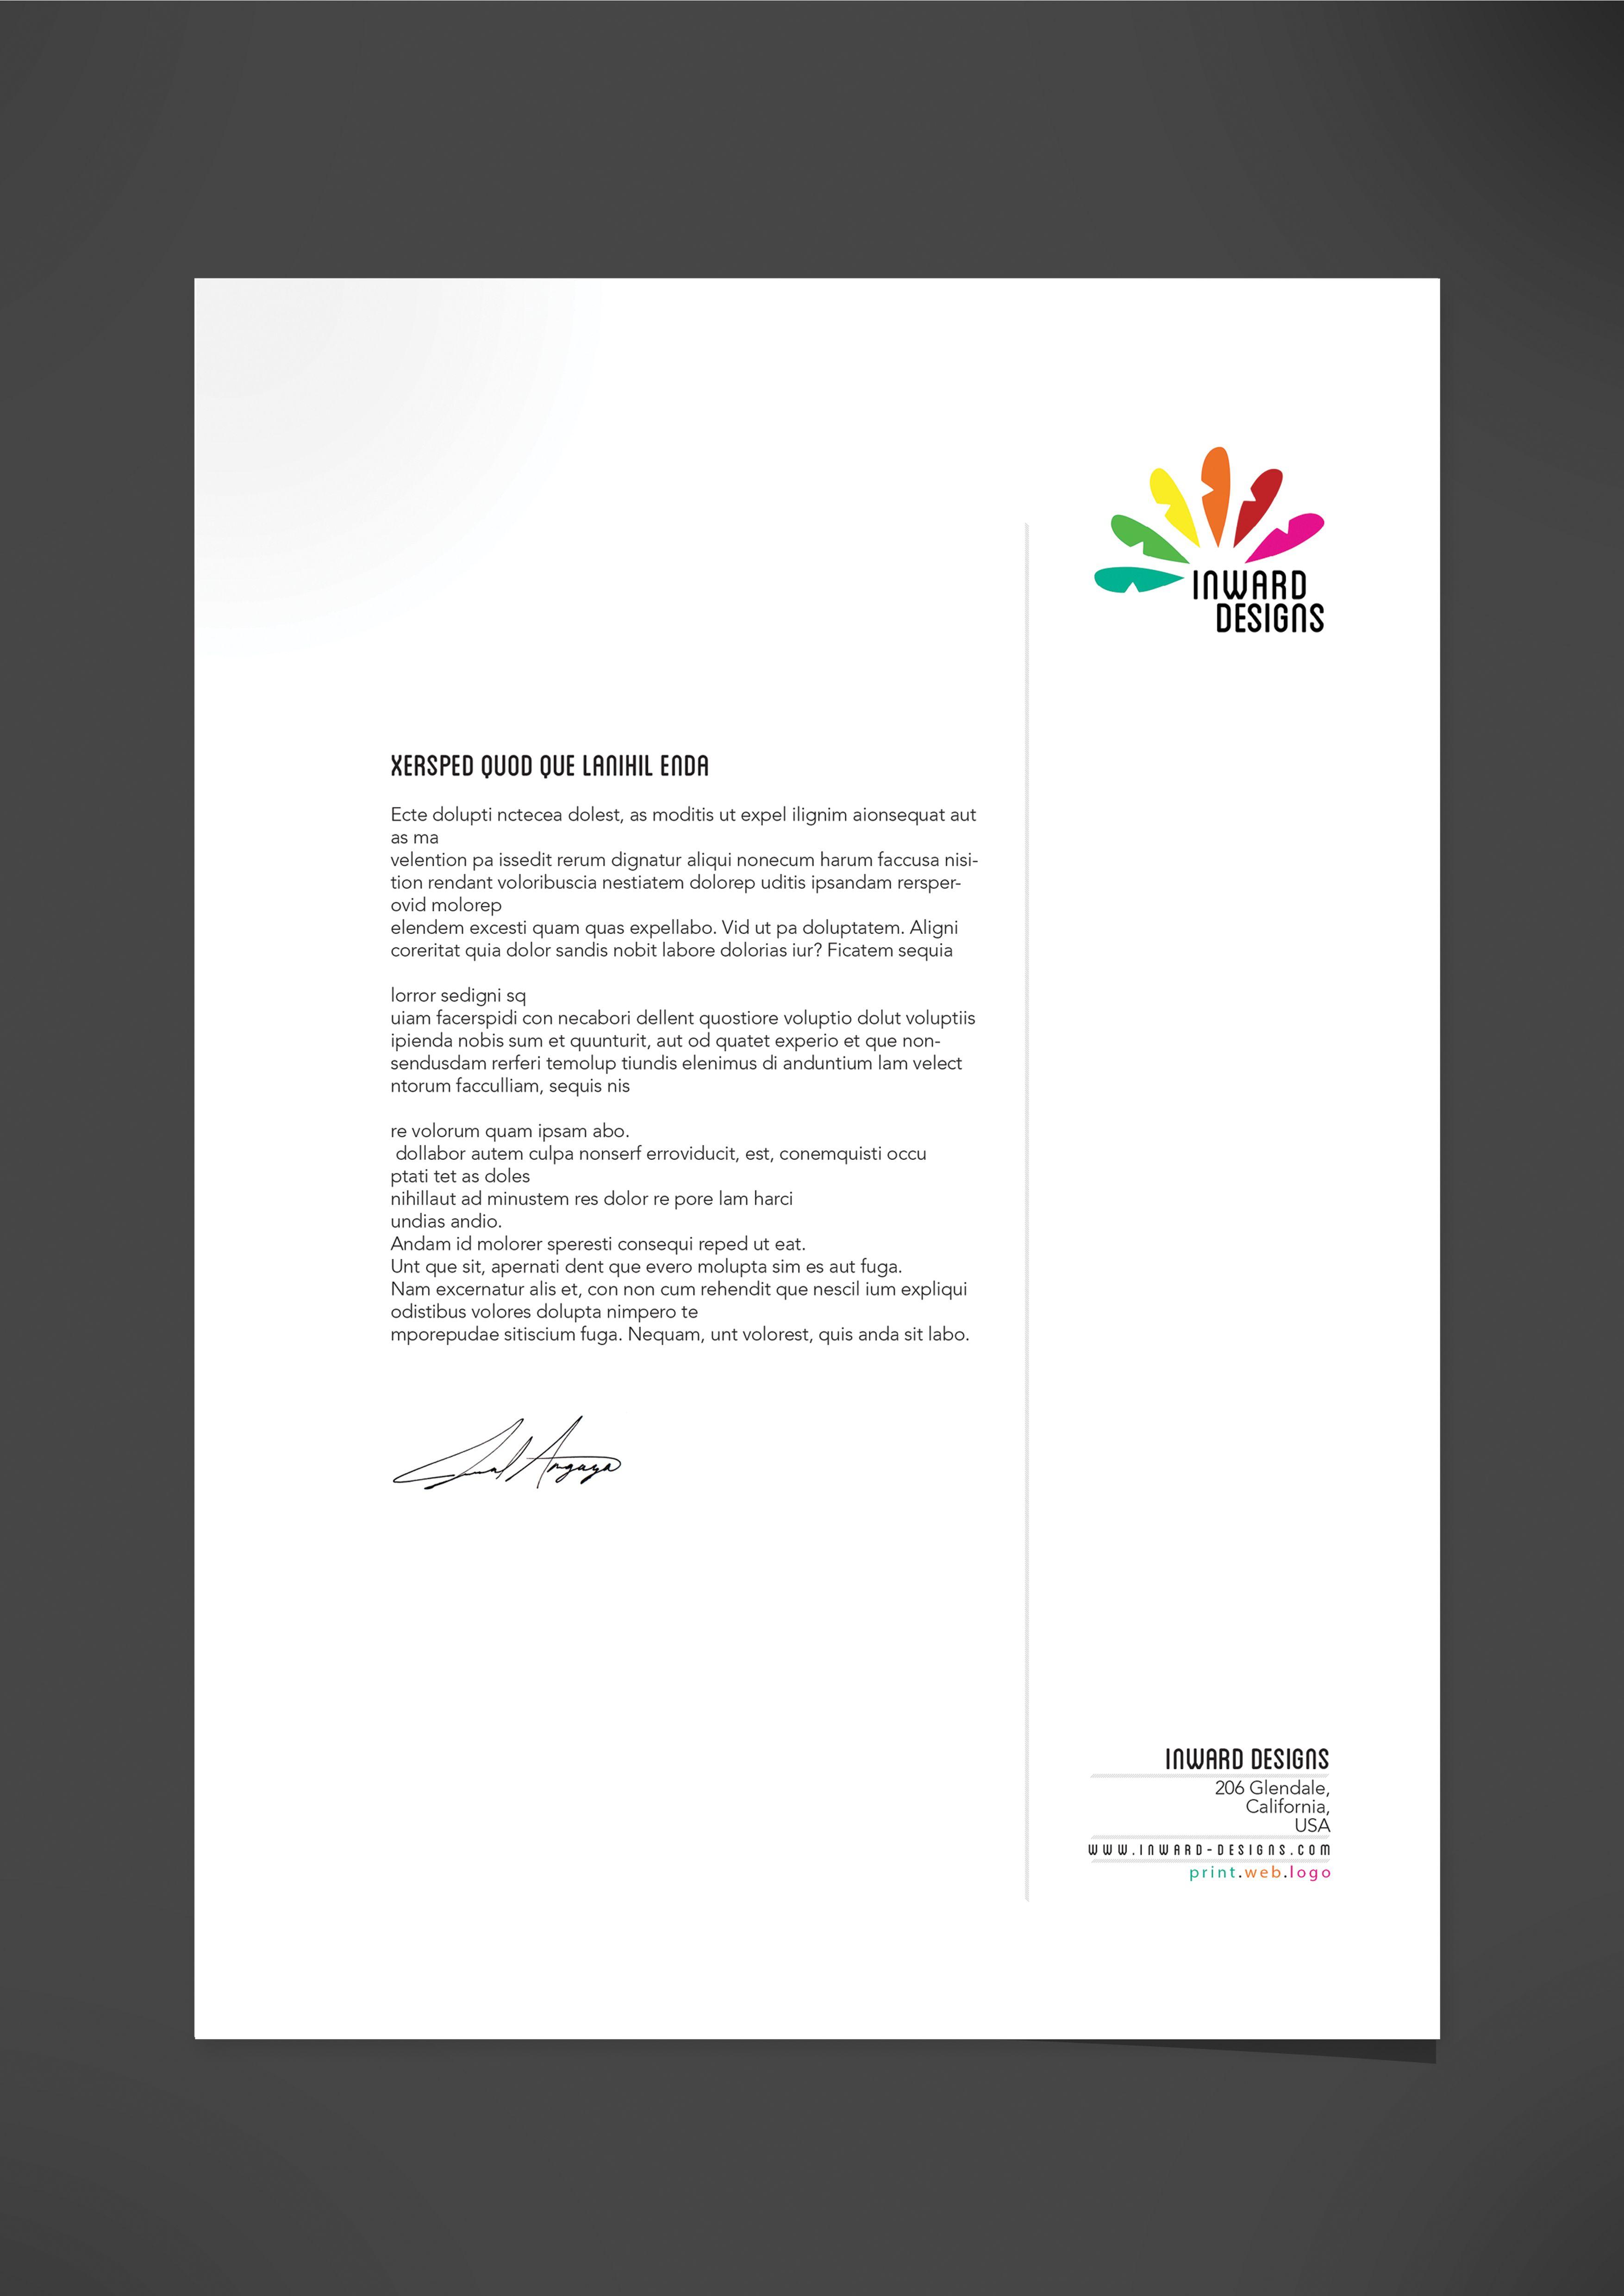 Letterhead design for a self branding brief project